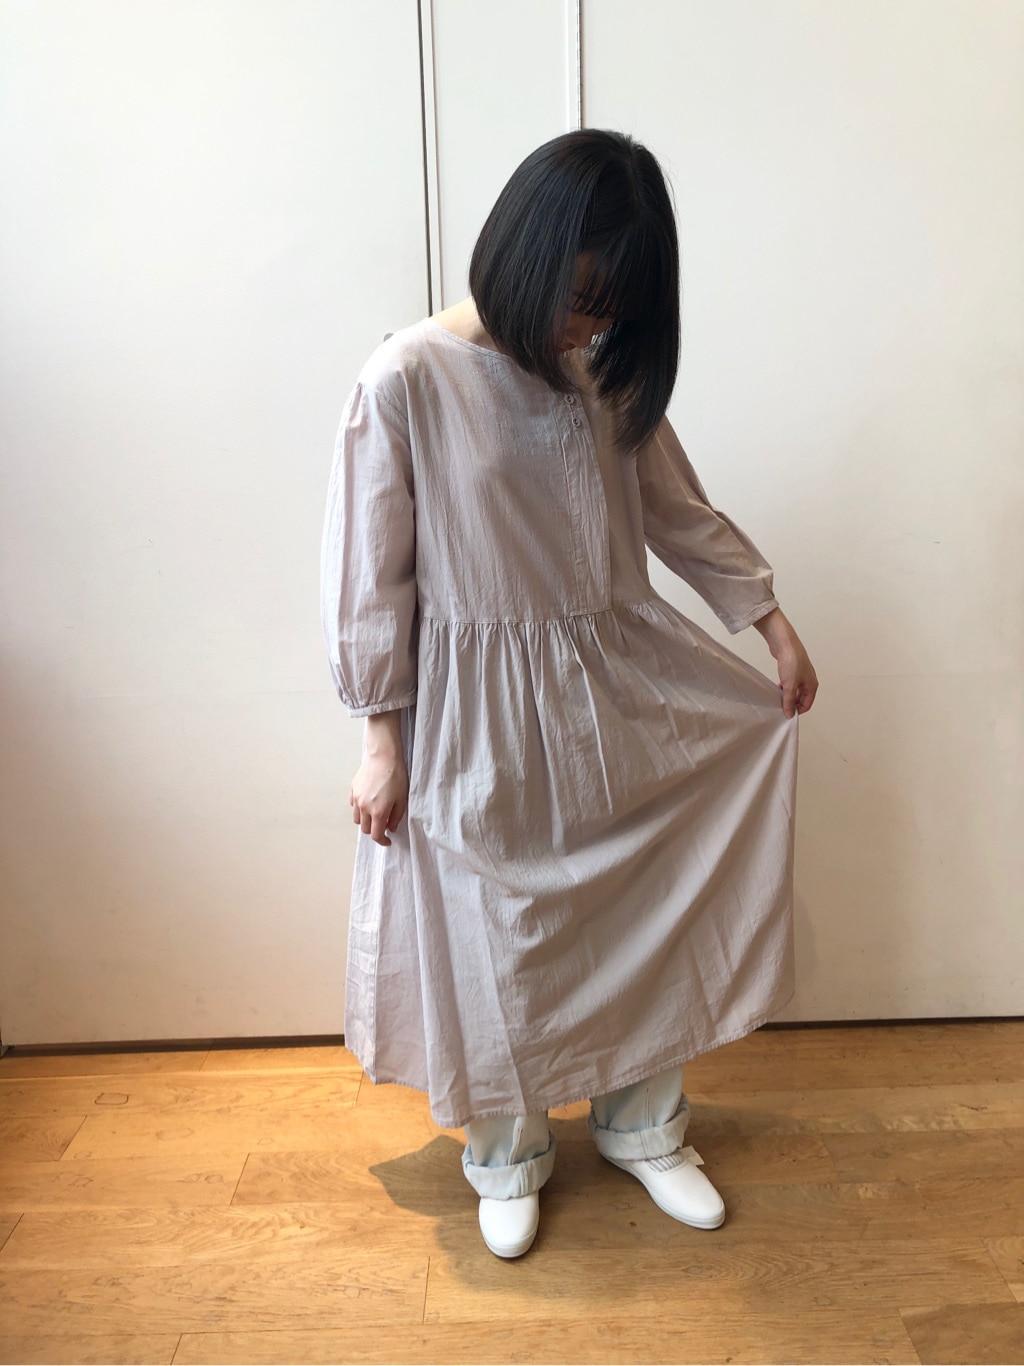 l'atelier du savon 広島パルコ 身長:152cm 2020.06.15